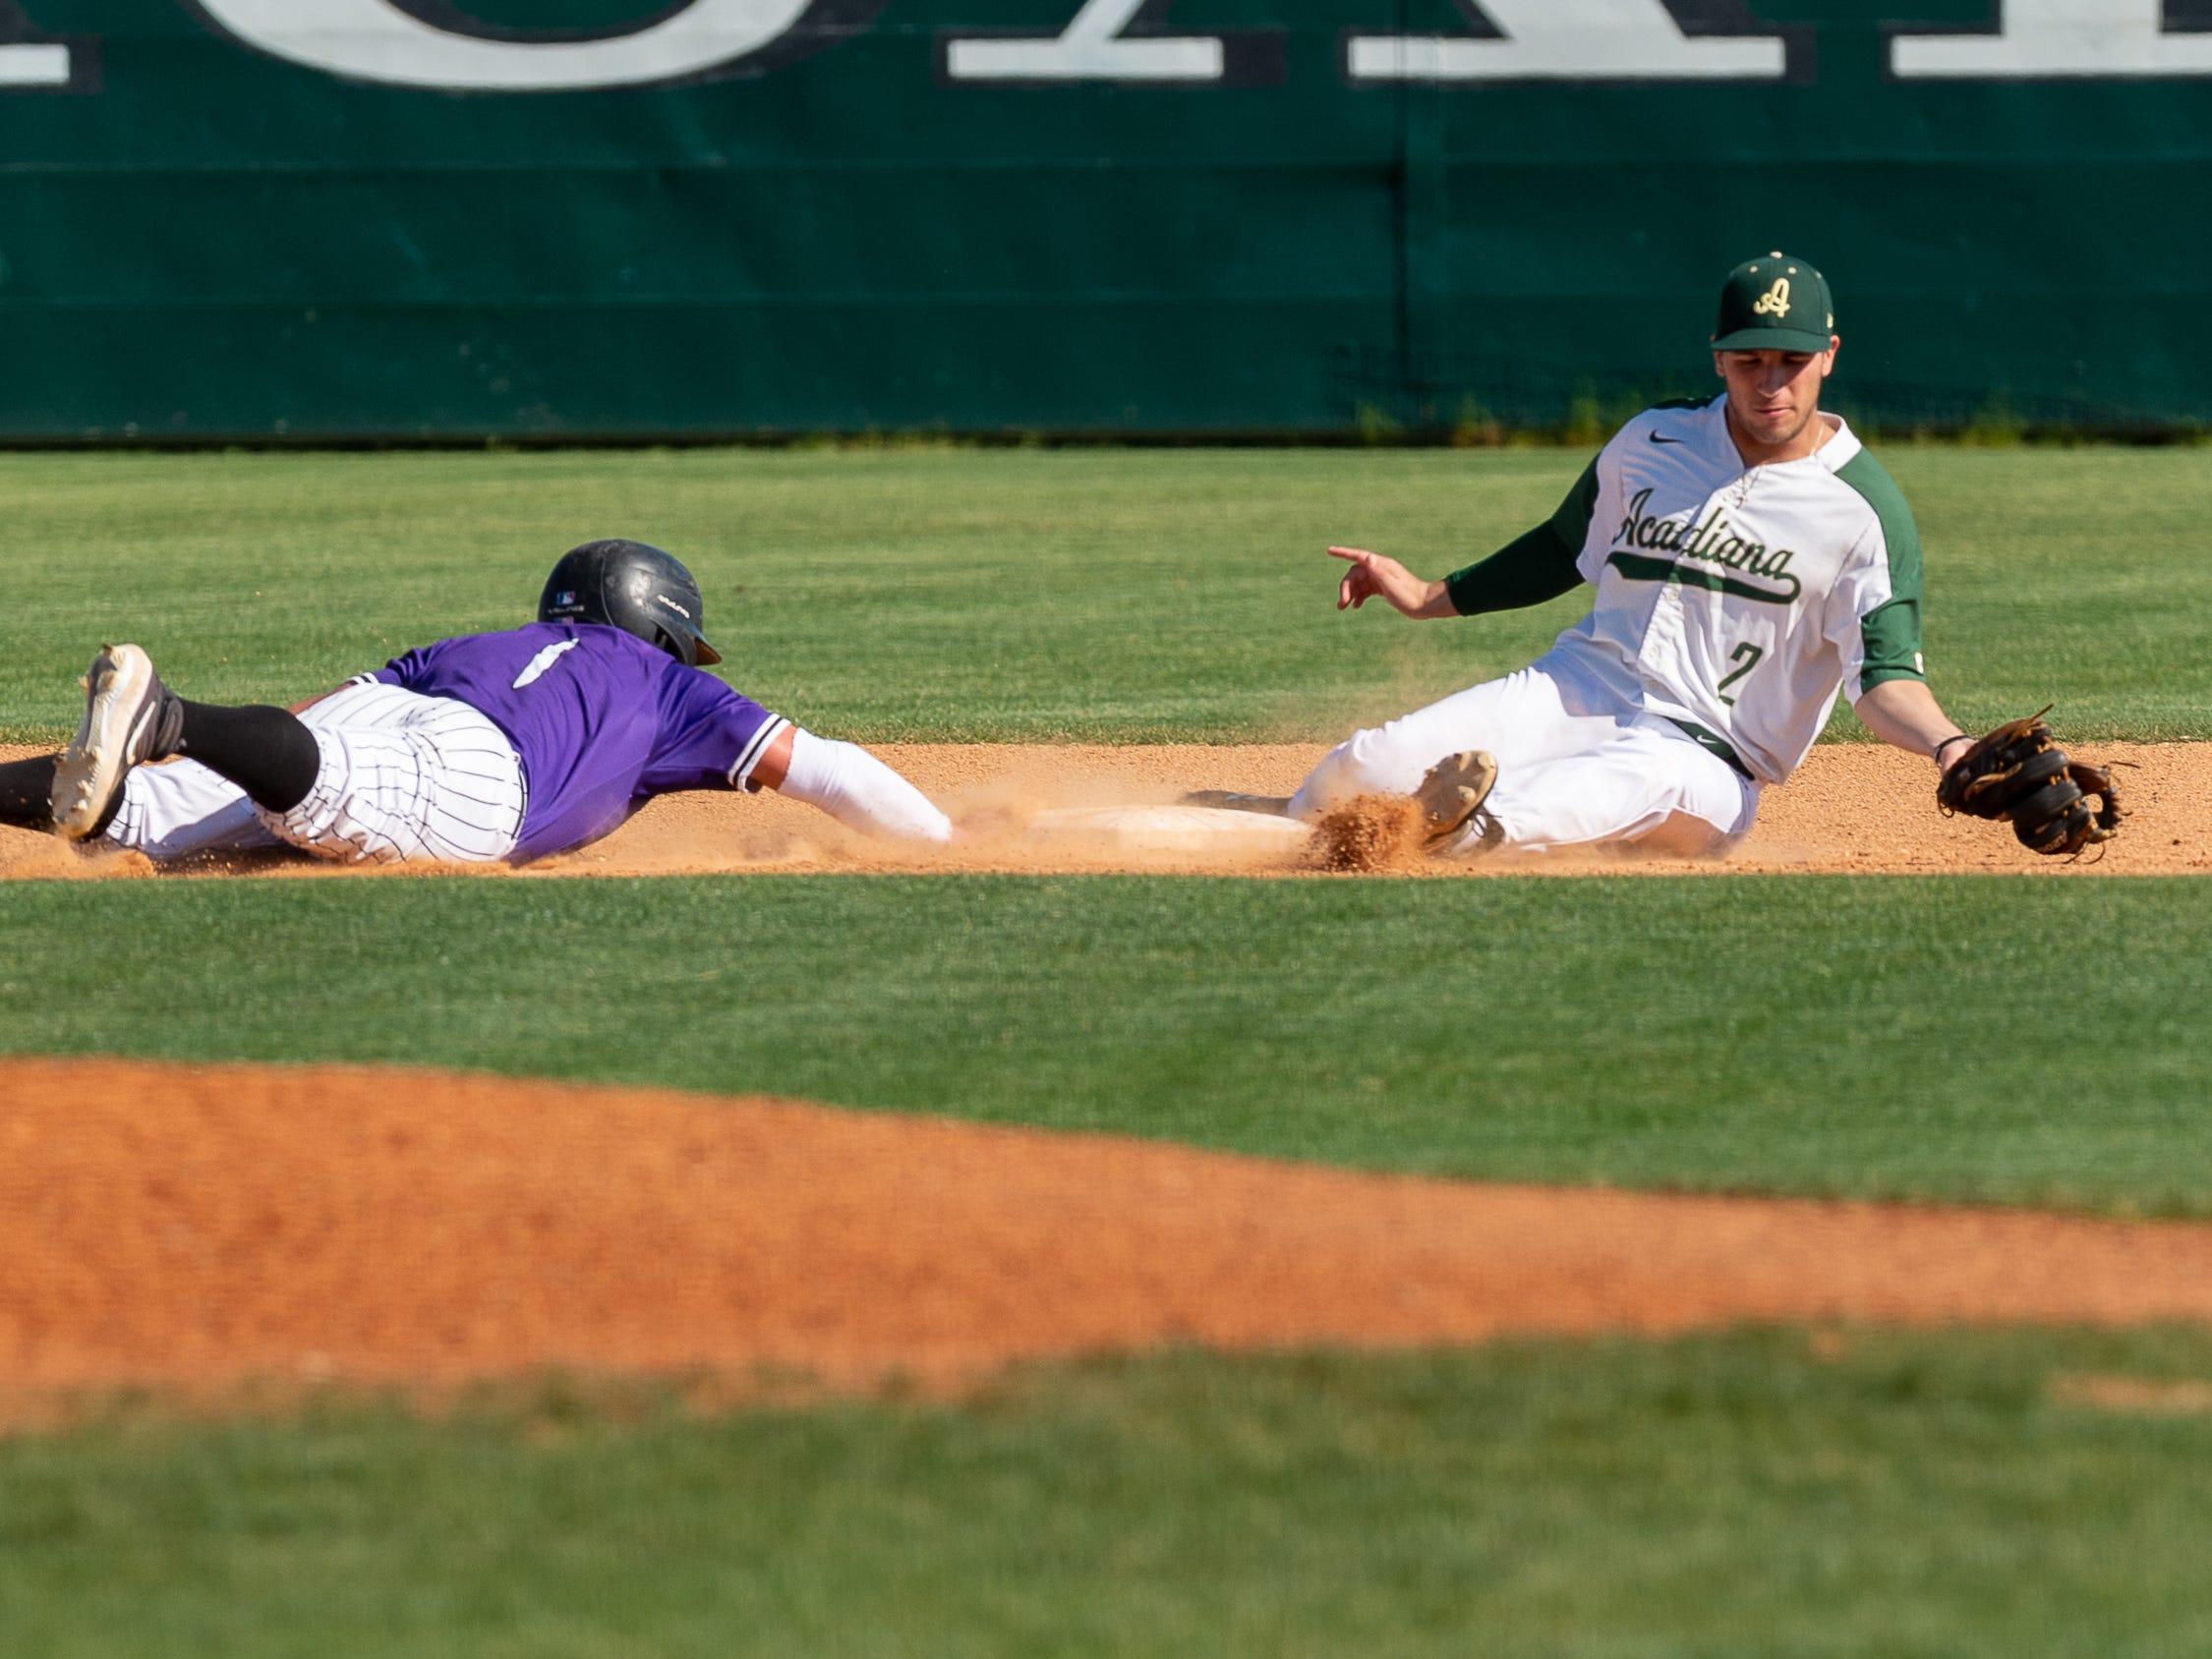 Garrett Felix covers second as Acadiana takes on Sam Houston baseball. Tuesday, March 26, 2019.